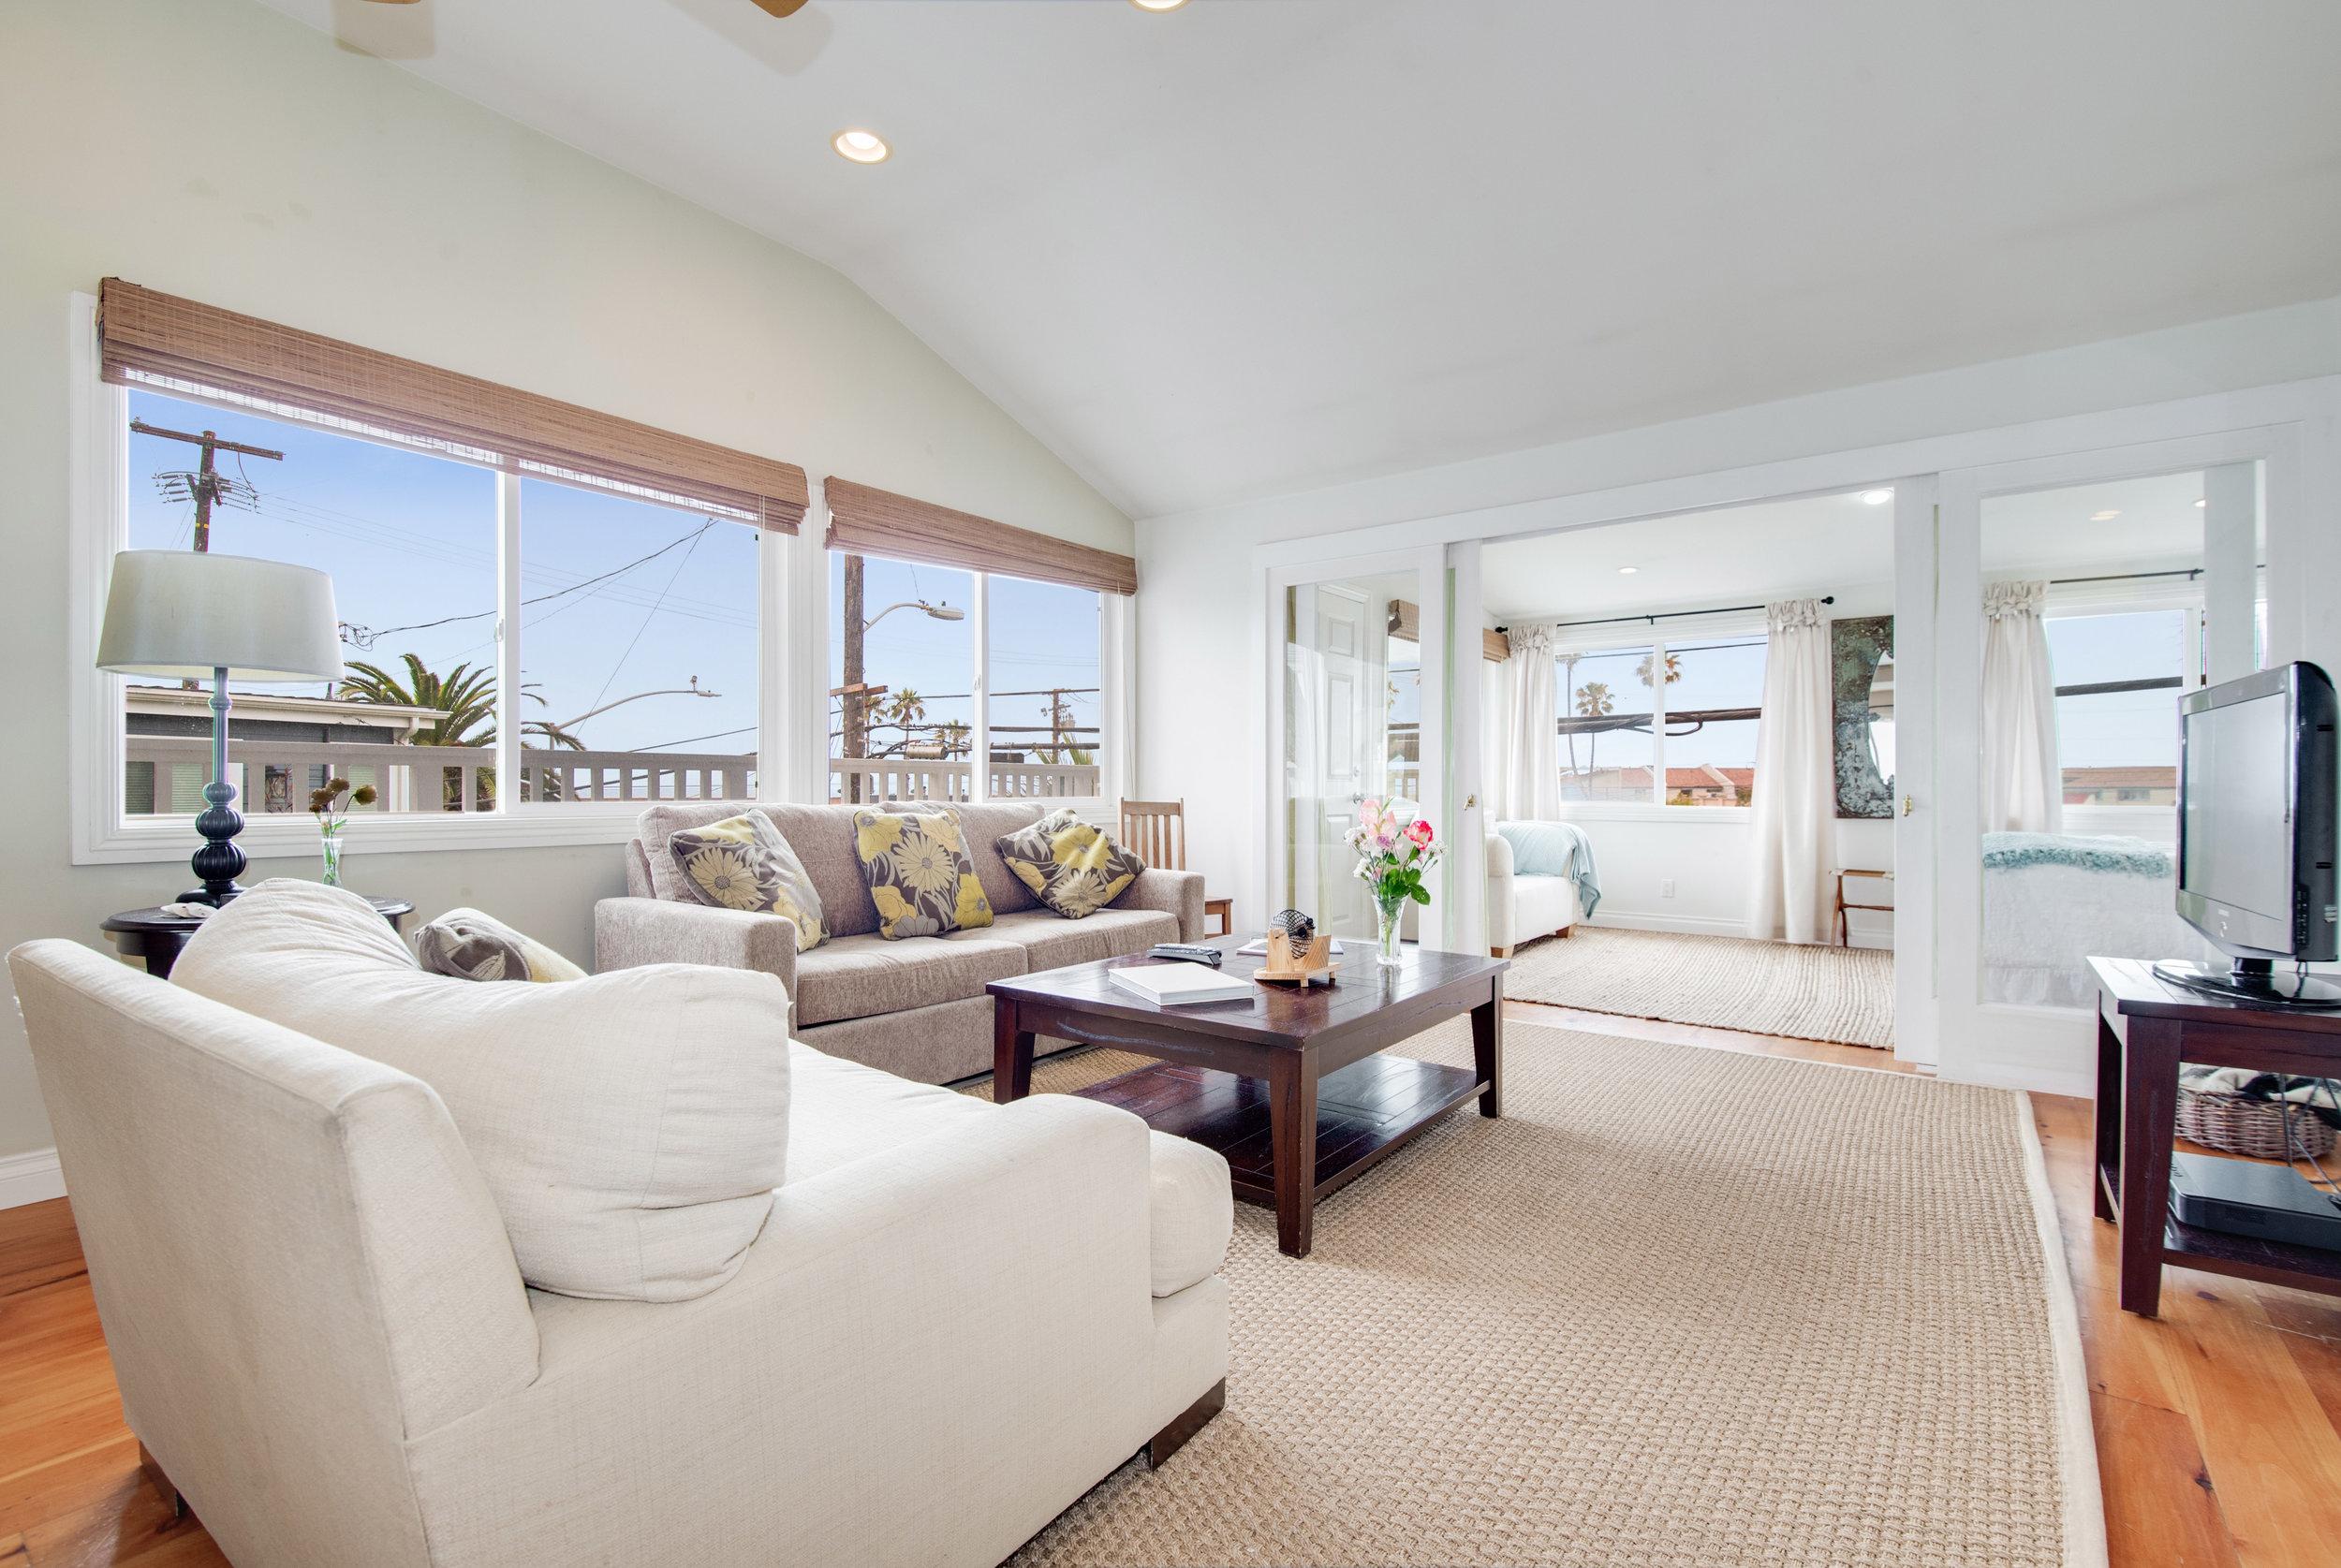 004 Living Room 3952 Las Flores For Sale Lease The Malibu Life Team Luxury Real Estate.jpg